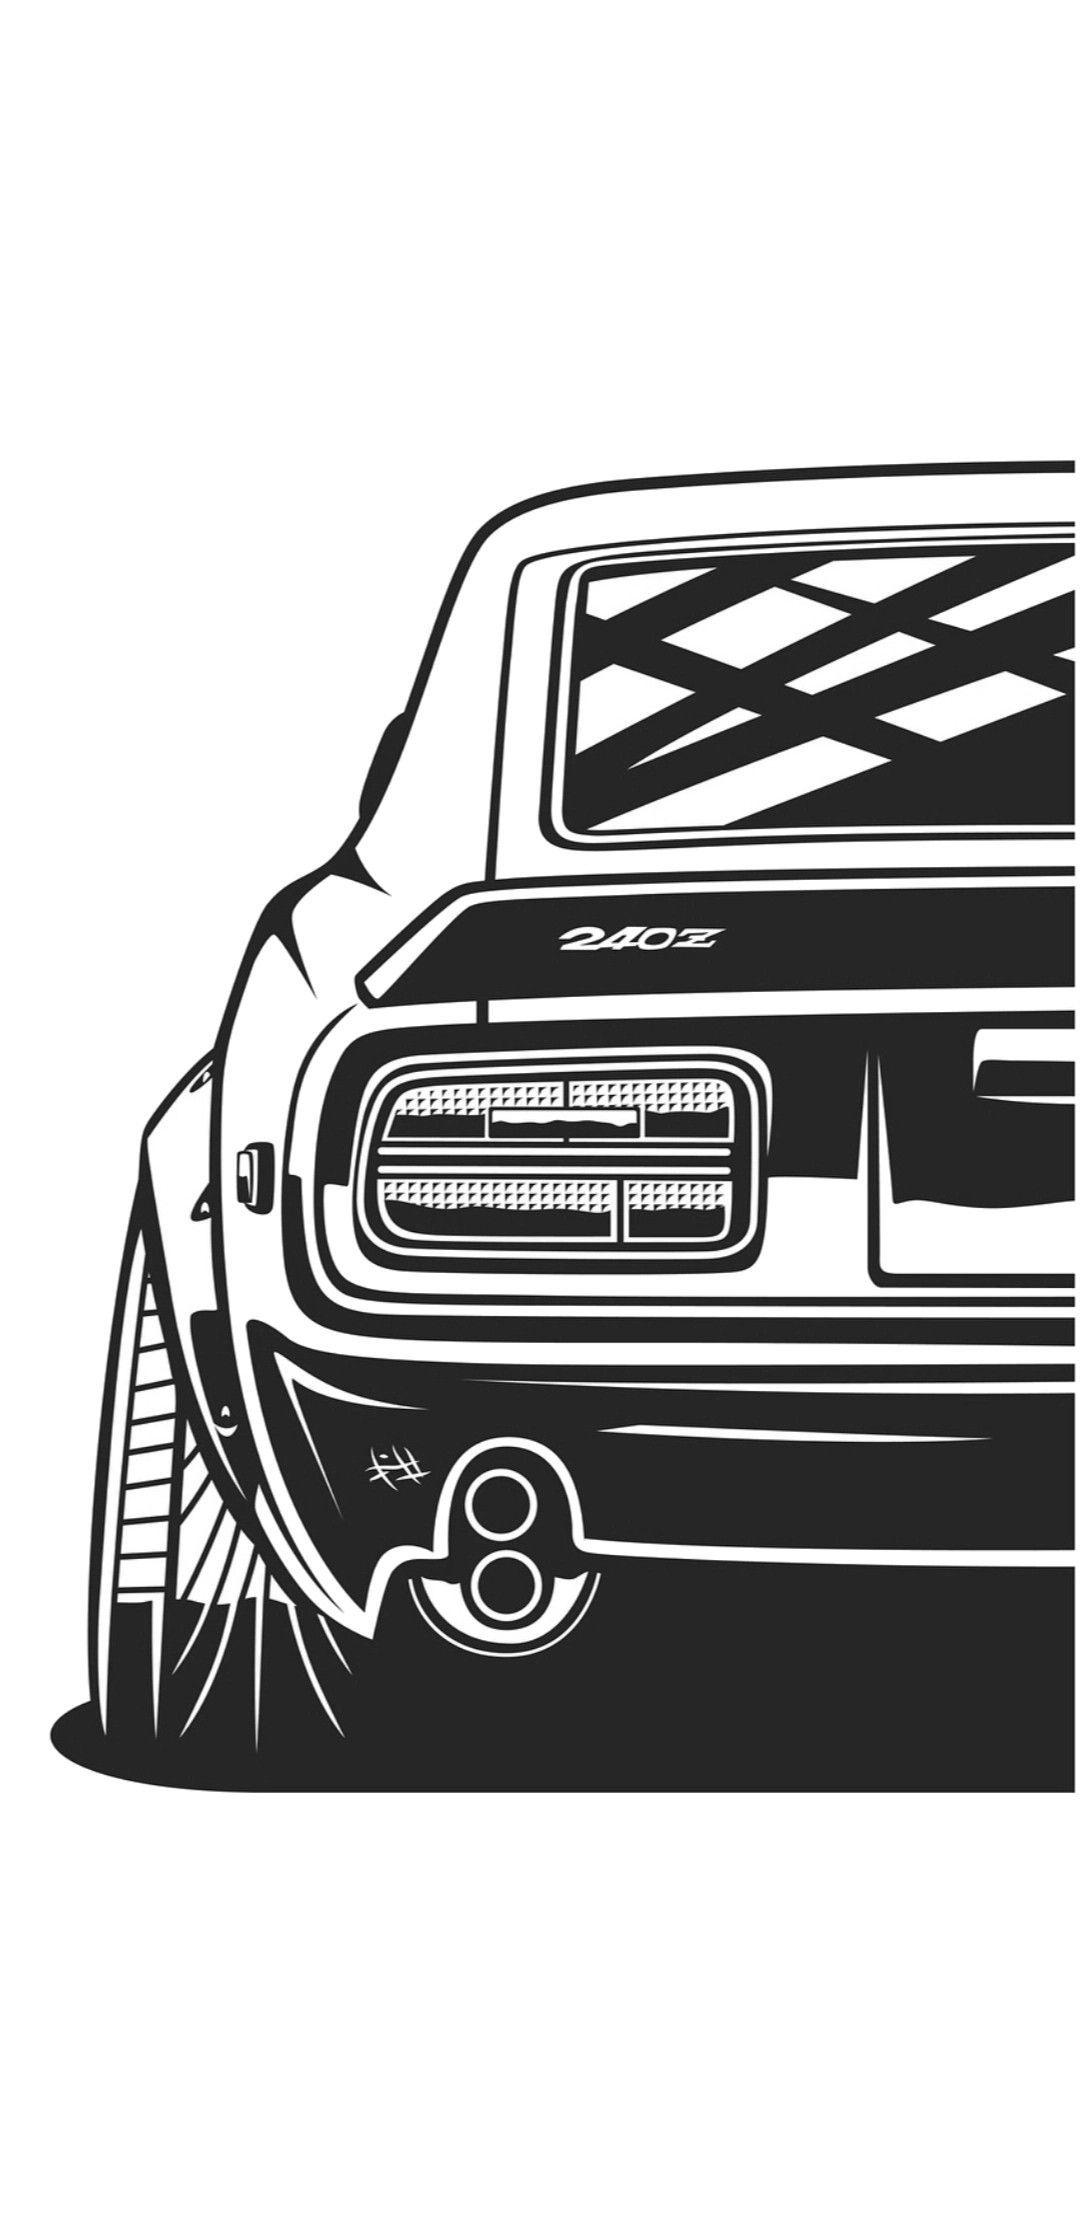 Best Drift Cars For Beginners Jdm Cars Cars Cool Car Drawings